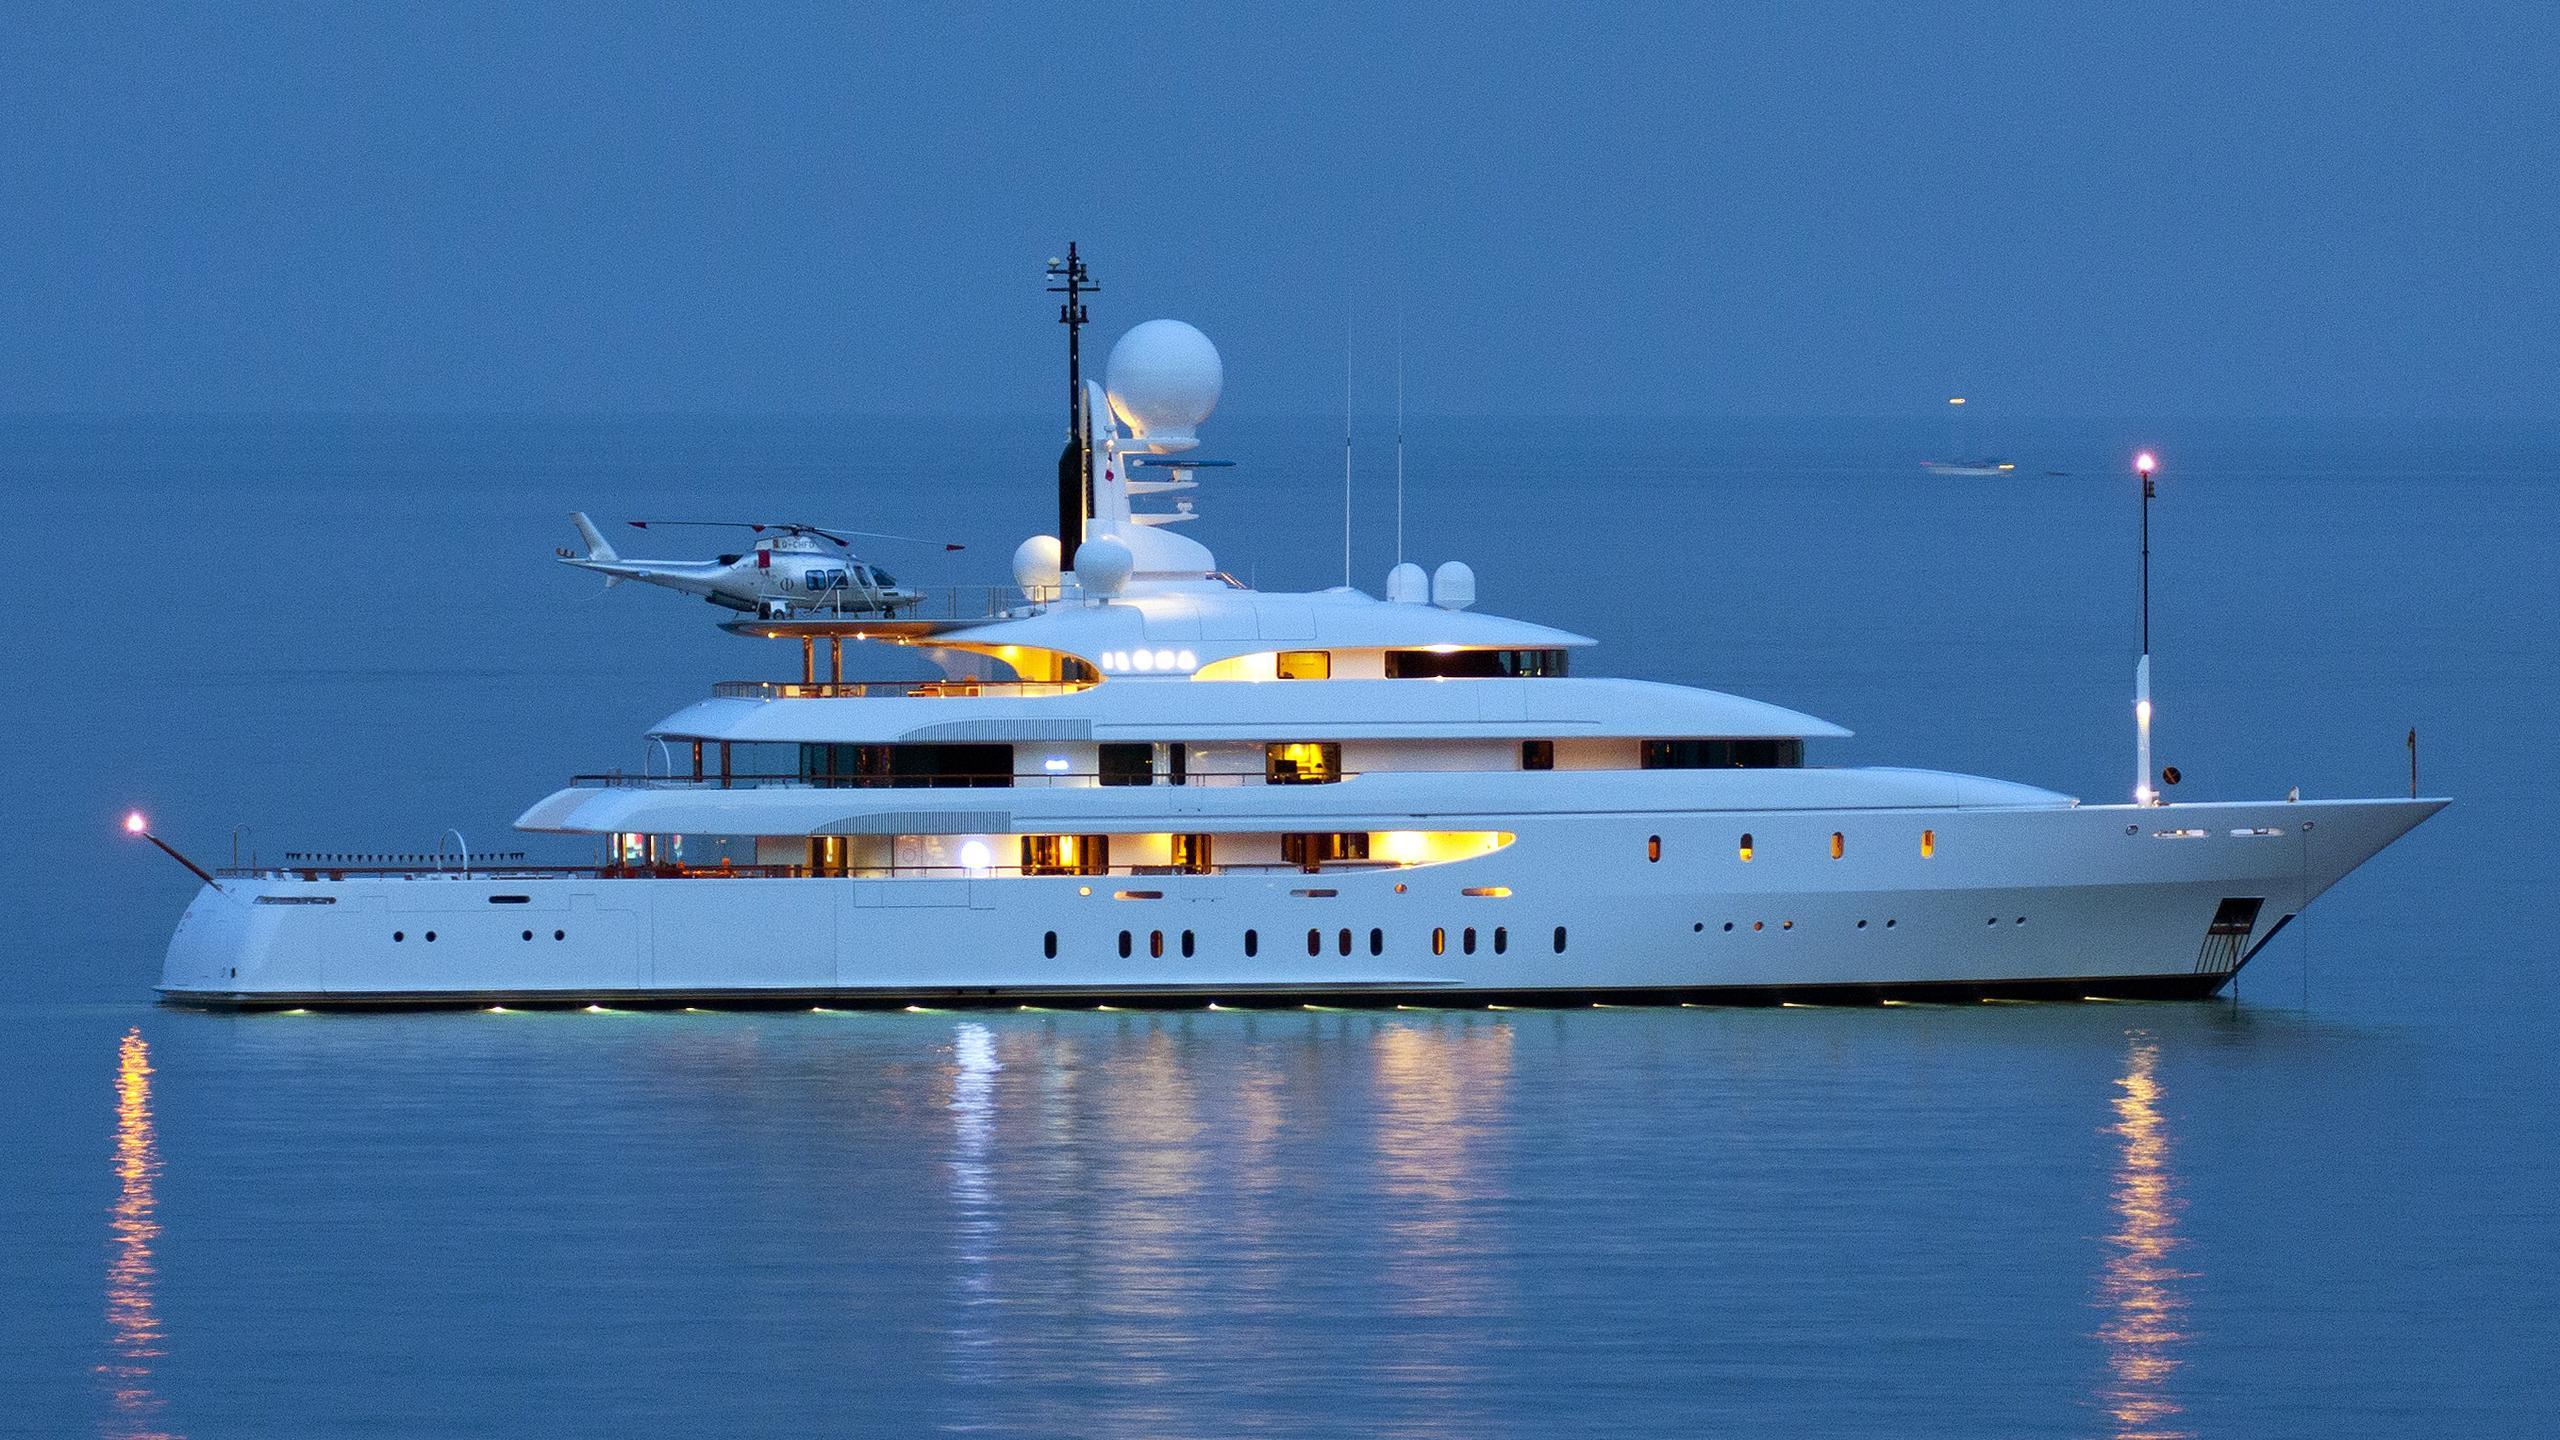 ilona-motor-yacht-amels-2003-74m-profile-by-night